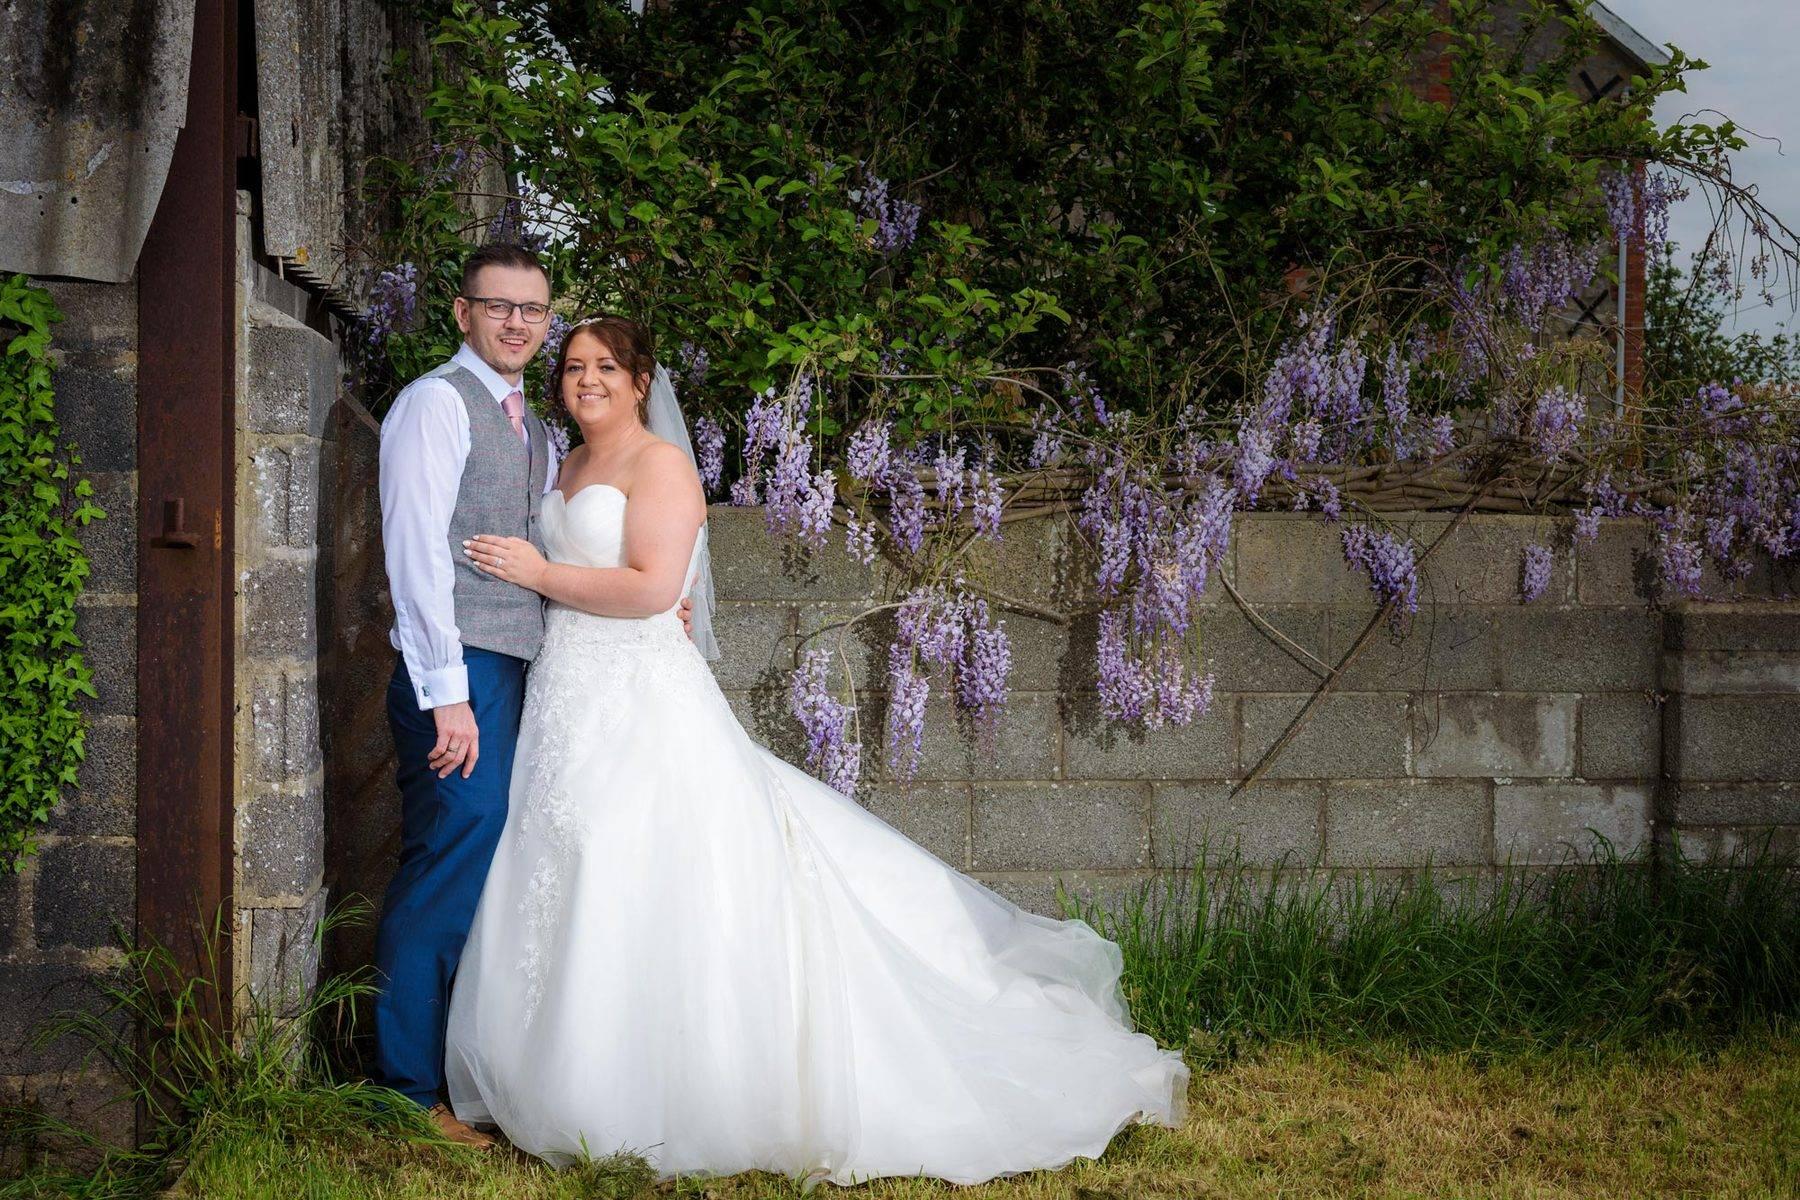 Sydenham Barn Wedding Photographer Featured